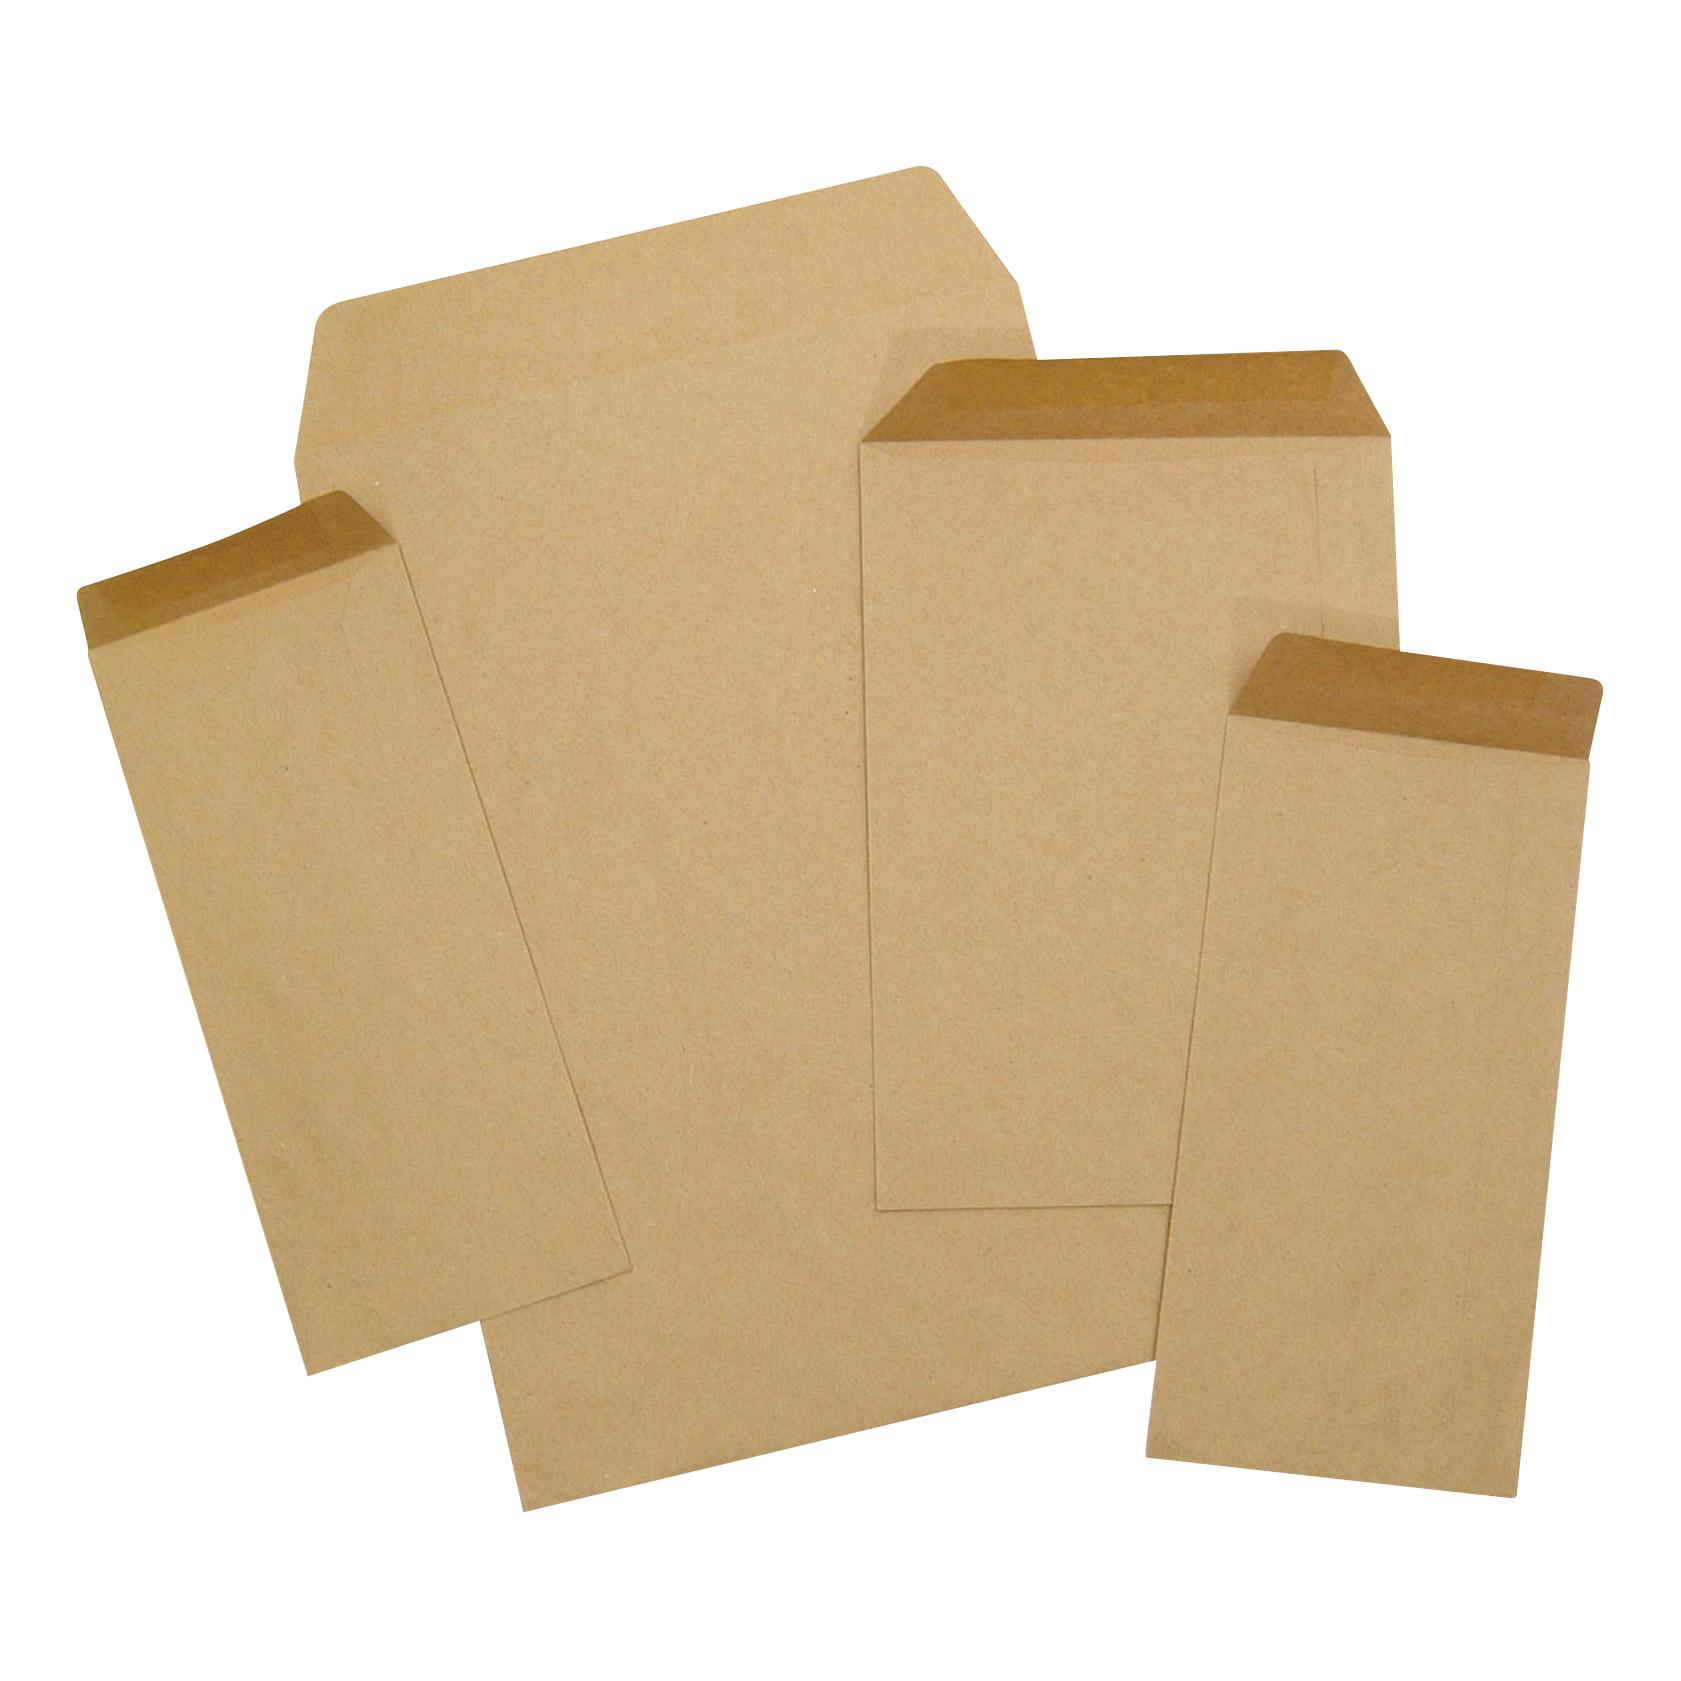 5 Star Office Envelopes Lightweight Pocket Gummed 80gsm Manilla DL [Pack 1000]